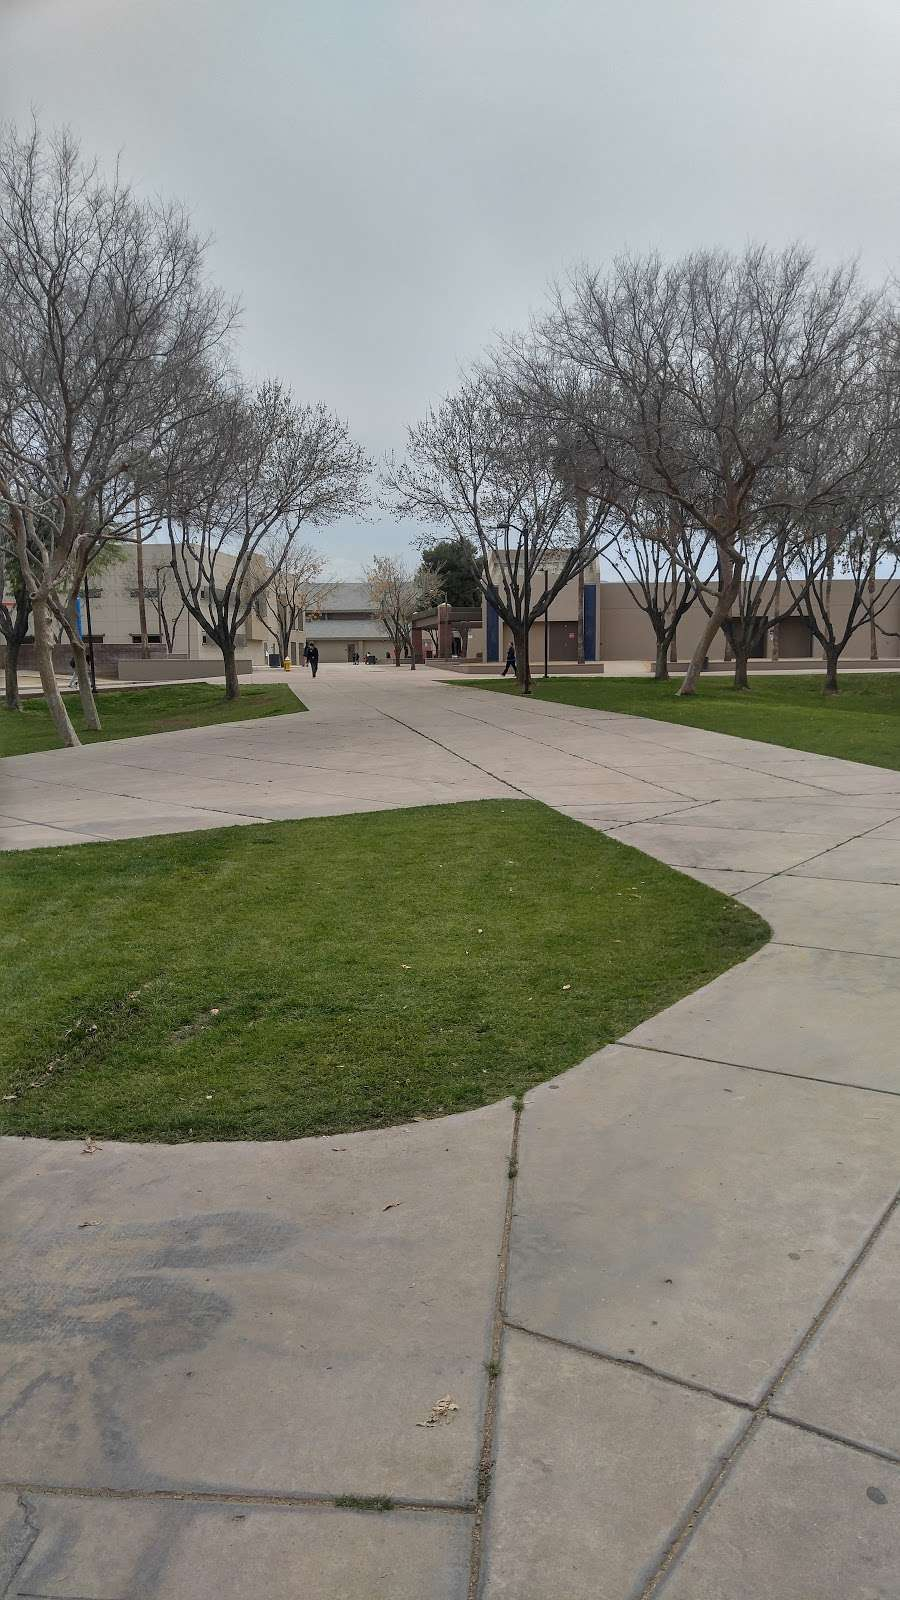 South Mountain High School - school  | Photo 1 of 7 | Address: 5401 S 7th St, Phoenix, AZ 85040, USA | Phone: (602) 764-5000